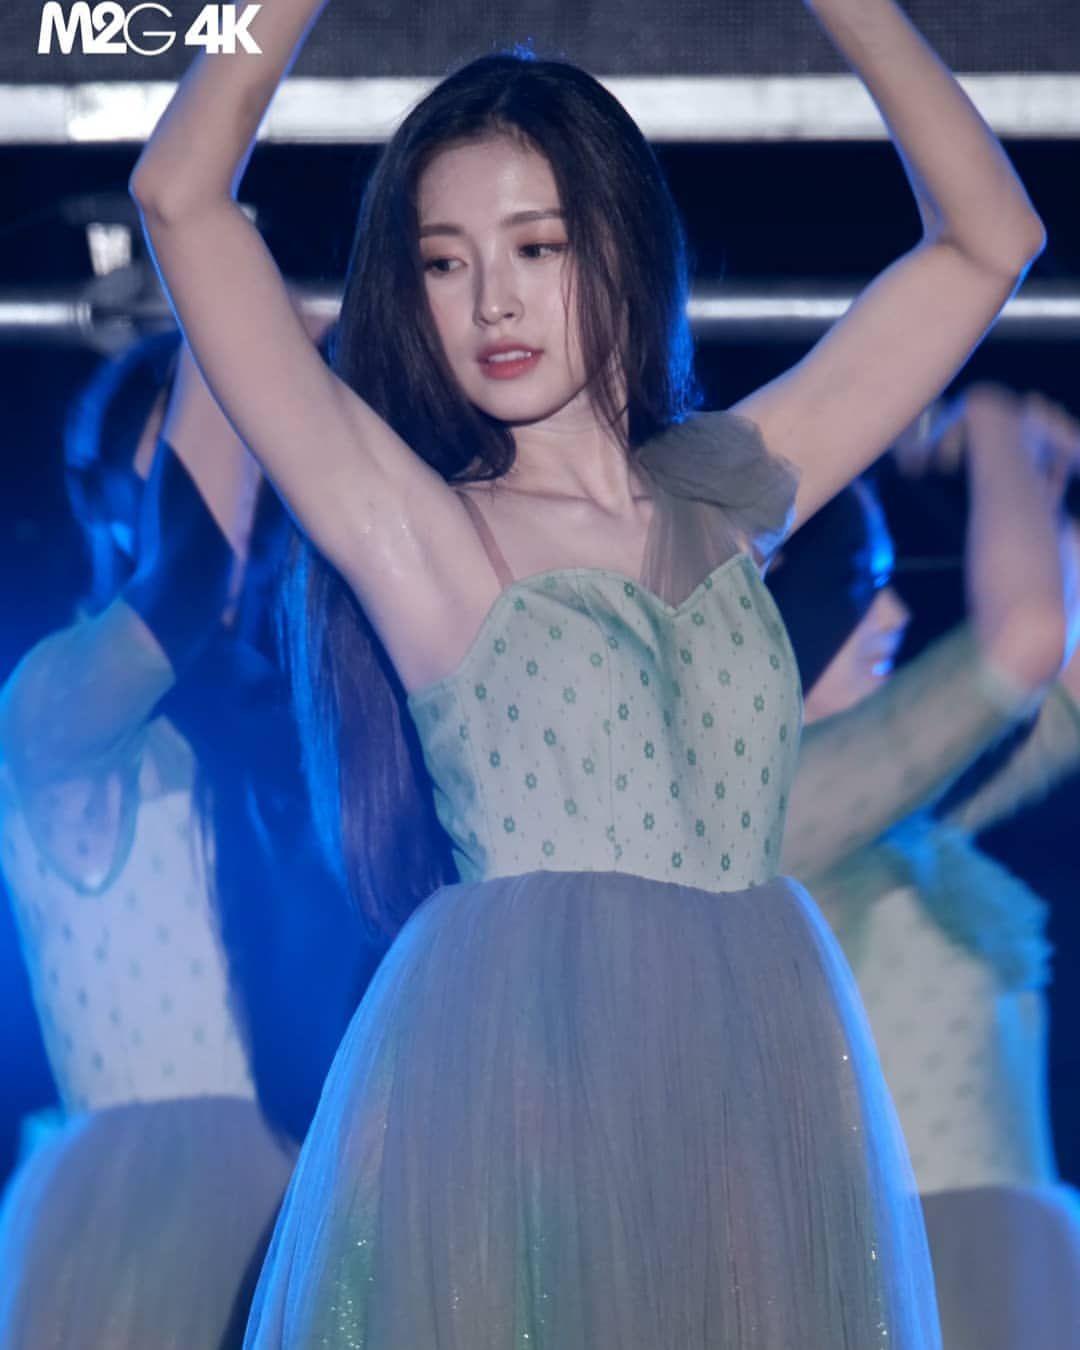 Kpop Pitsさんはinstagramを利用しています Sweaty Armpits Of Arin Of Oh My Girl Arin Omg Ohmygirl Miracle Ohmygirlarin Kpoparmpit Kpoparmpits Armpits Armpit